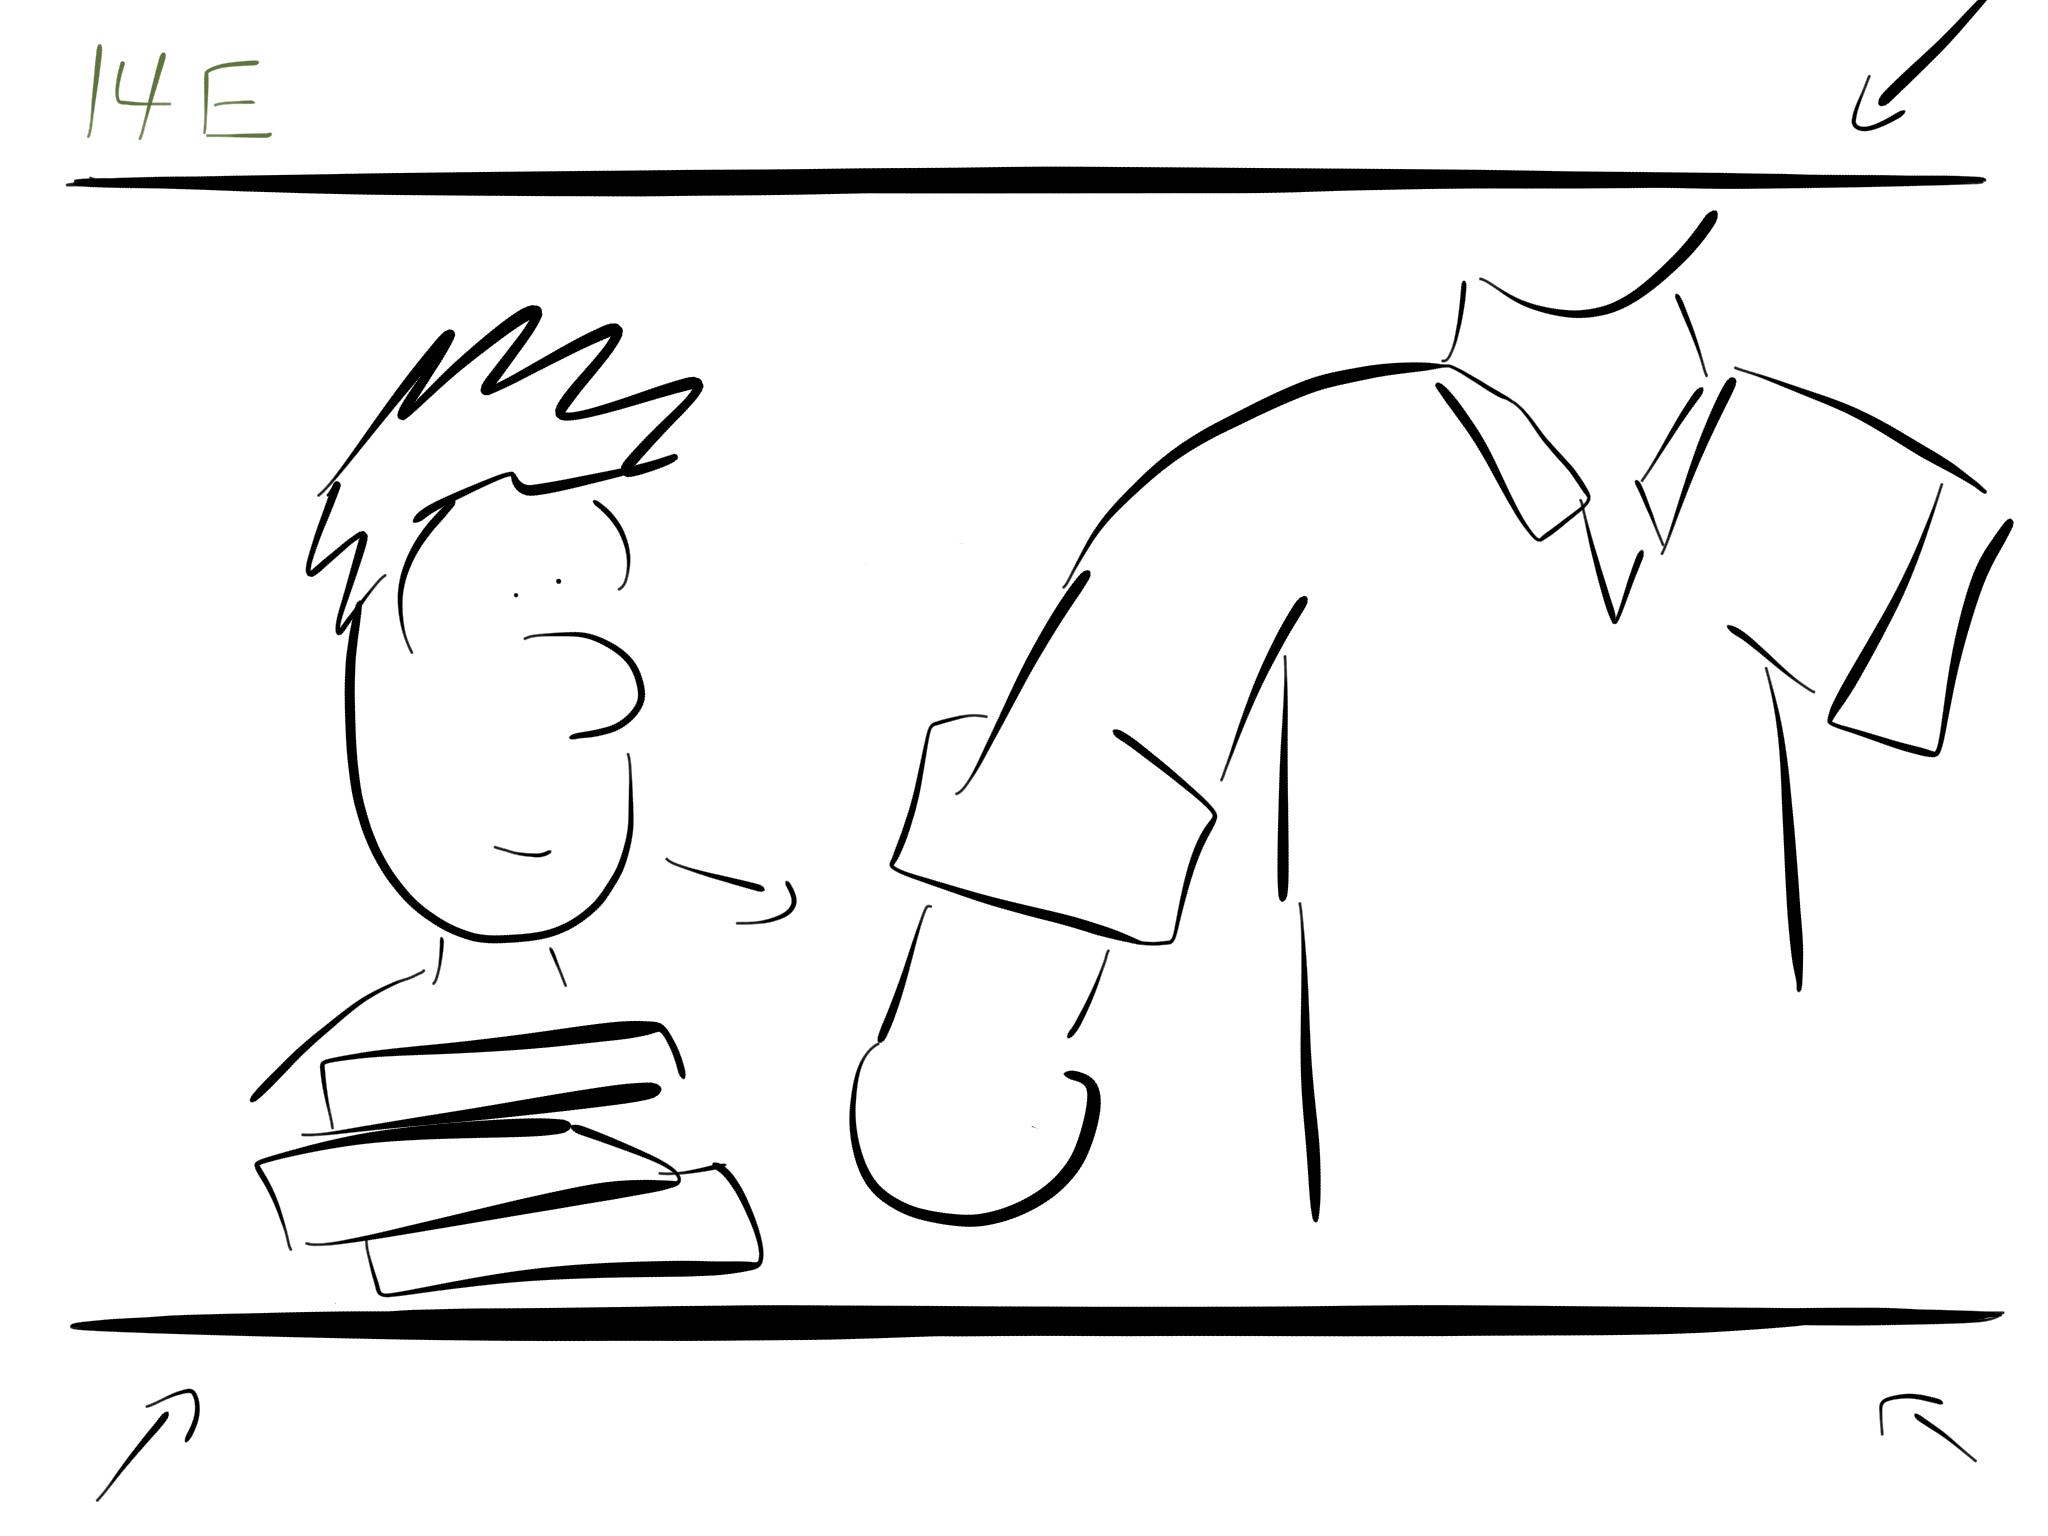 BDF_Storyboards_57.jpg